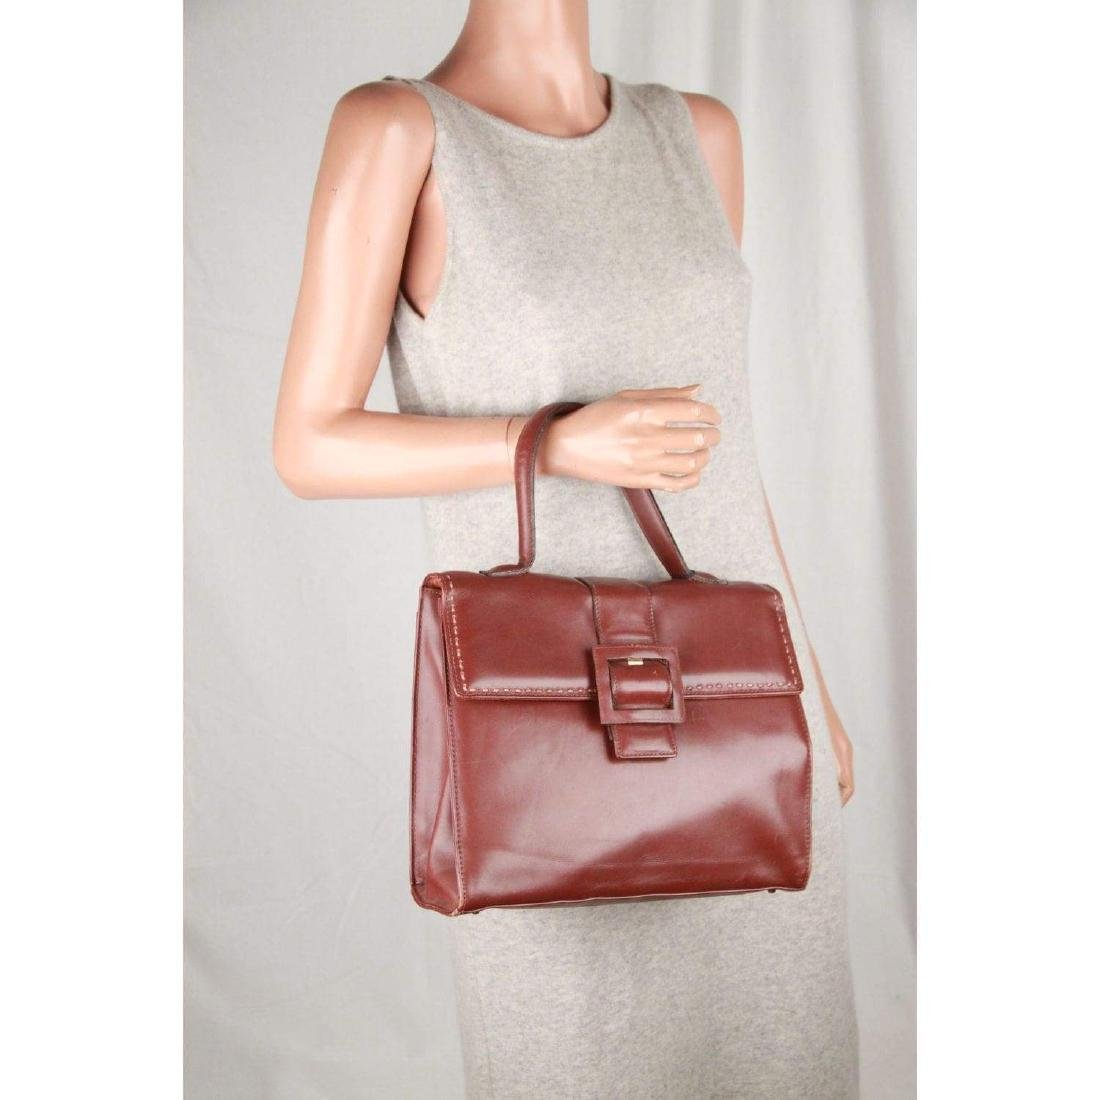 MONTENAPOLEONE Vintage Brown Leather HANDBAG - 7